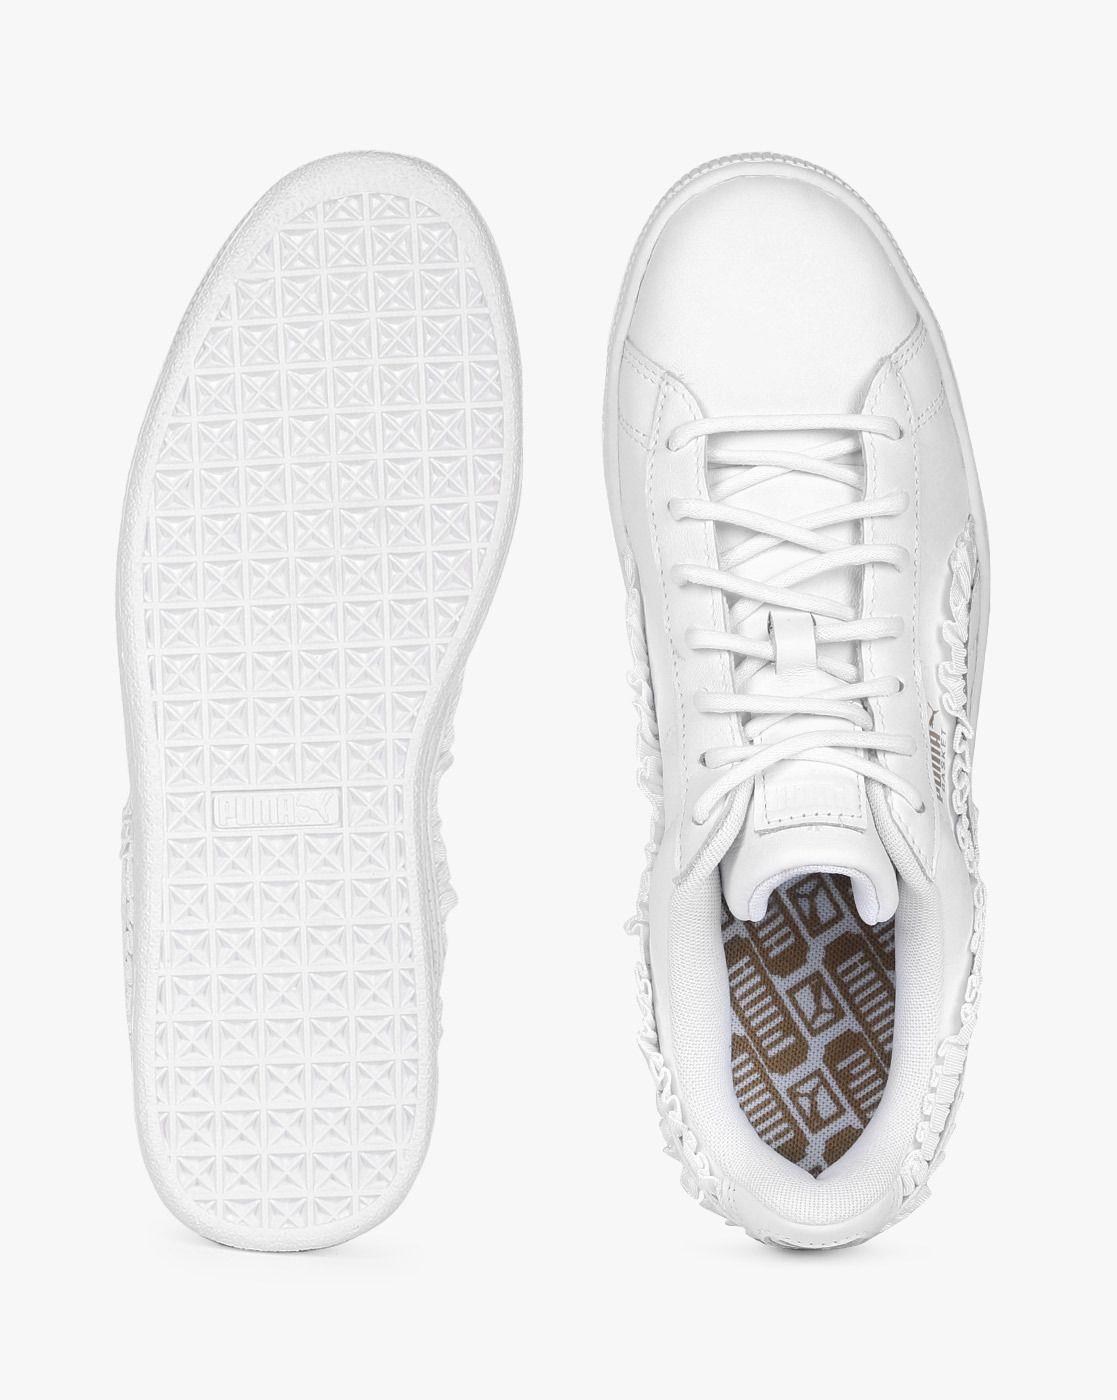 Buy Puma Women White Leather Lace-Up